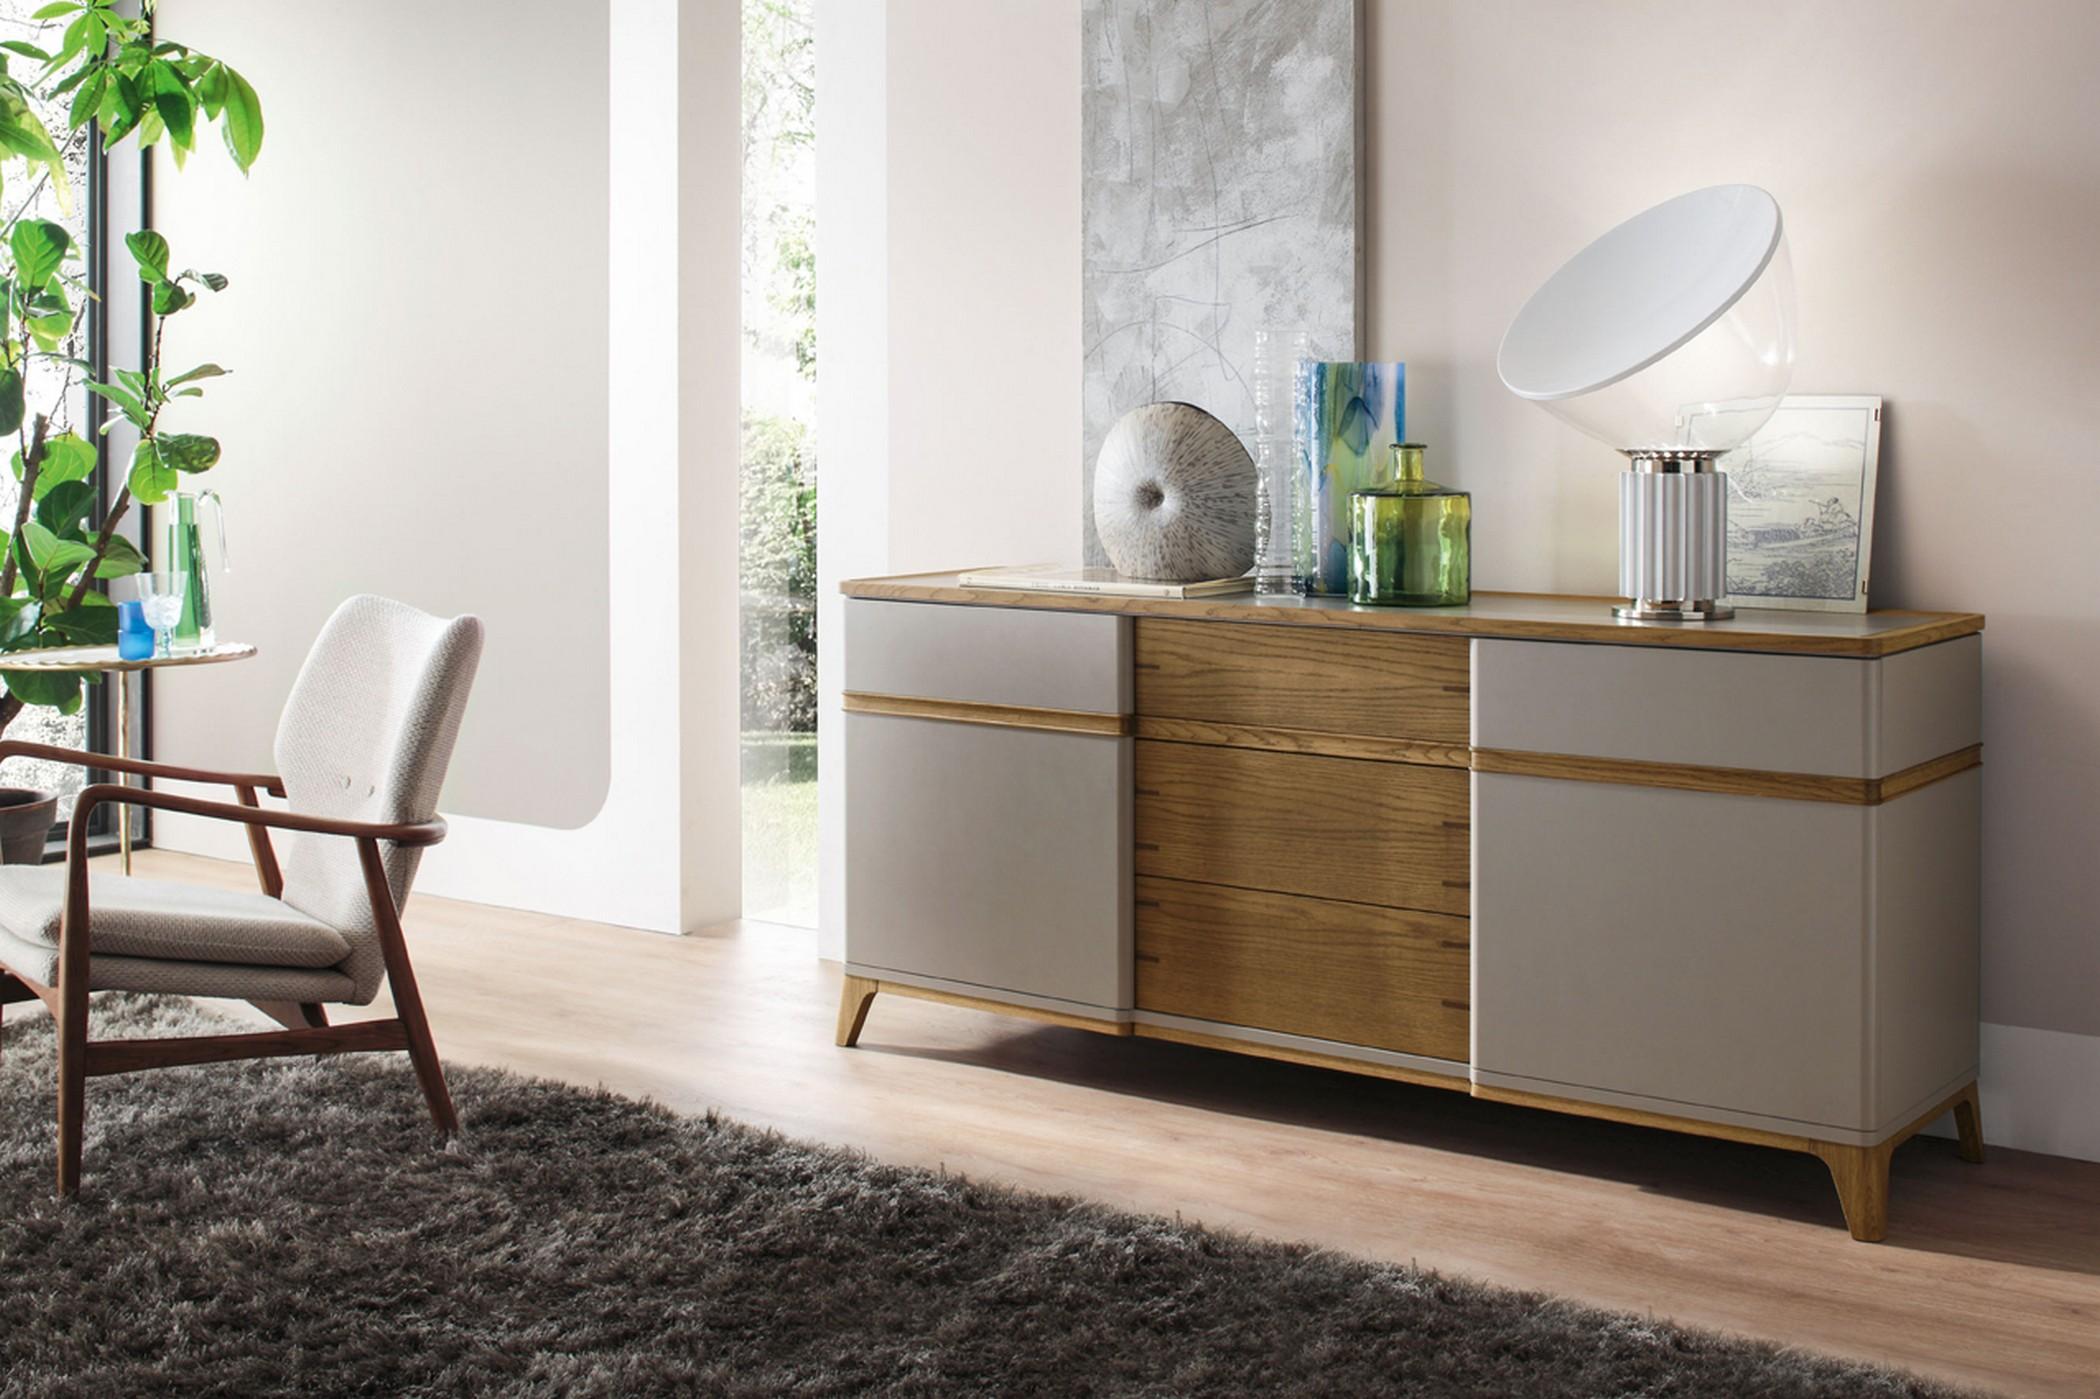 Stunning Le Fablier Spa Gallery  Home Design  joygreeinfo